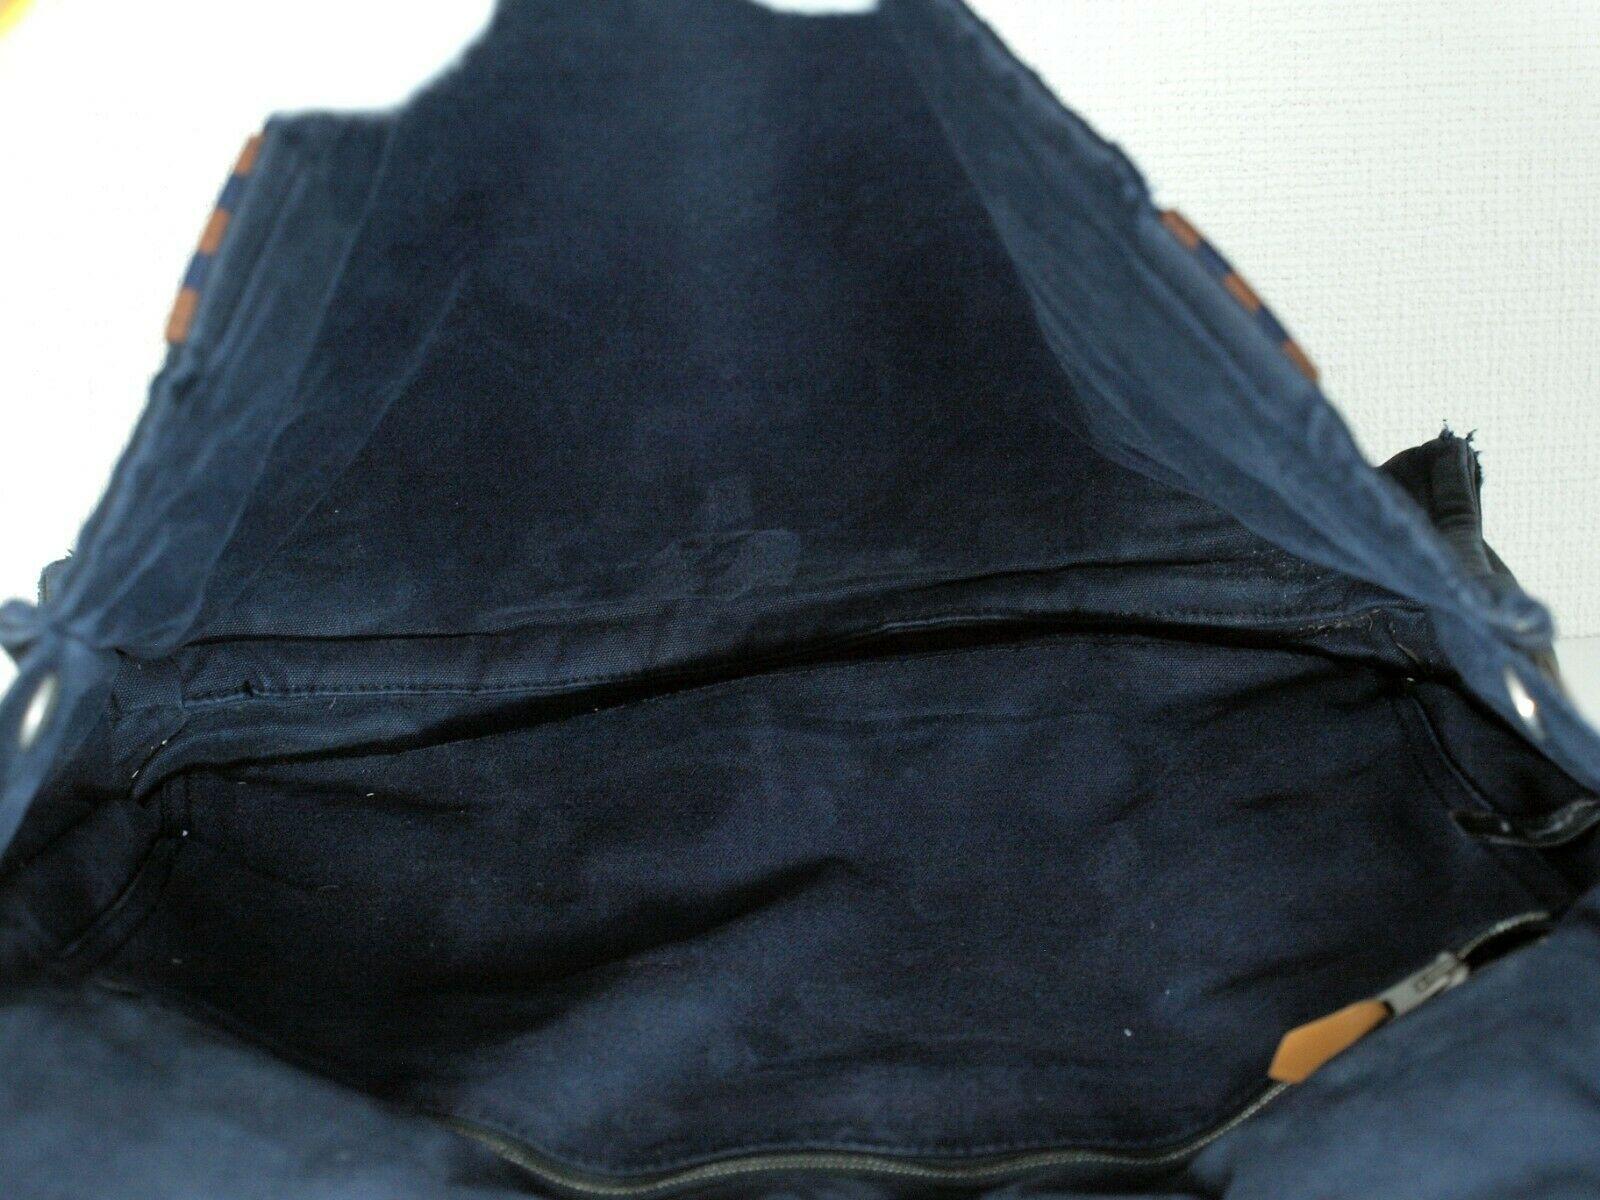 Auth Hermes Fool Toe Vassus MM Navy Cotton Canvas Shoulder Bag Purse France Used image 8